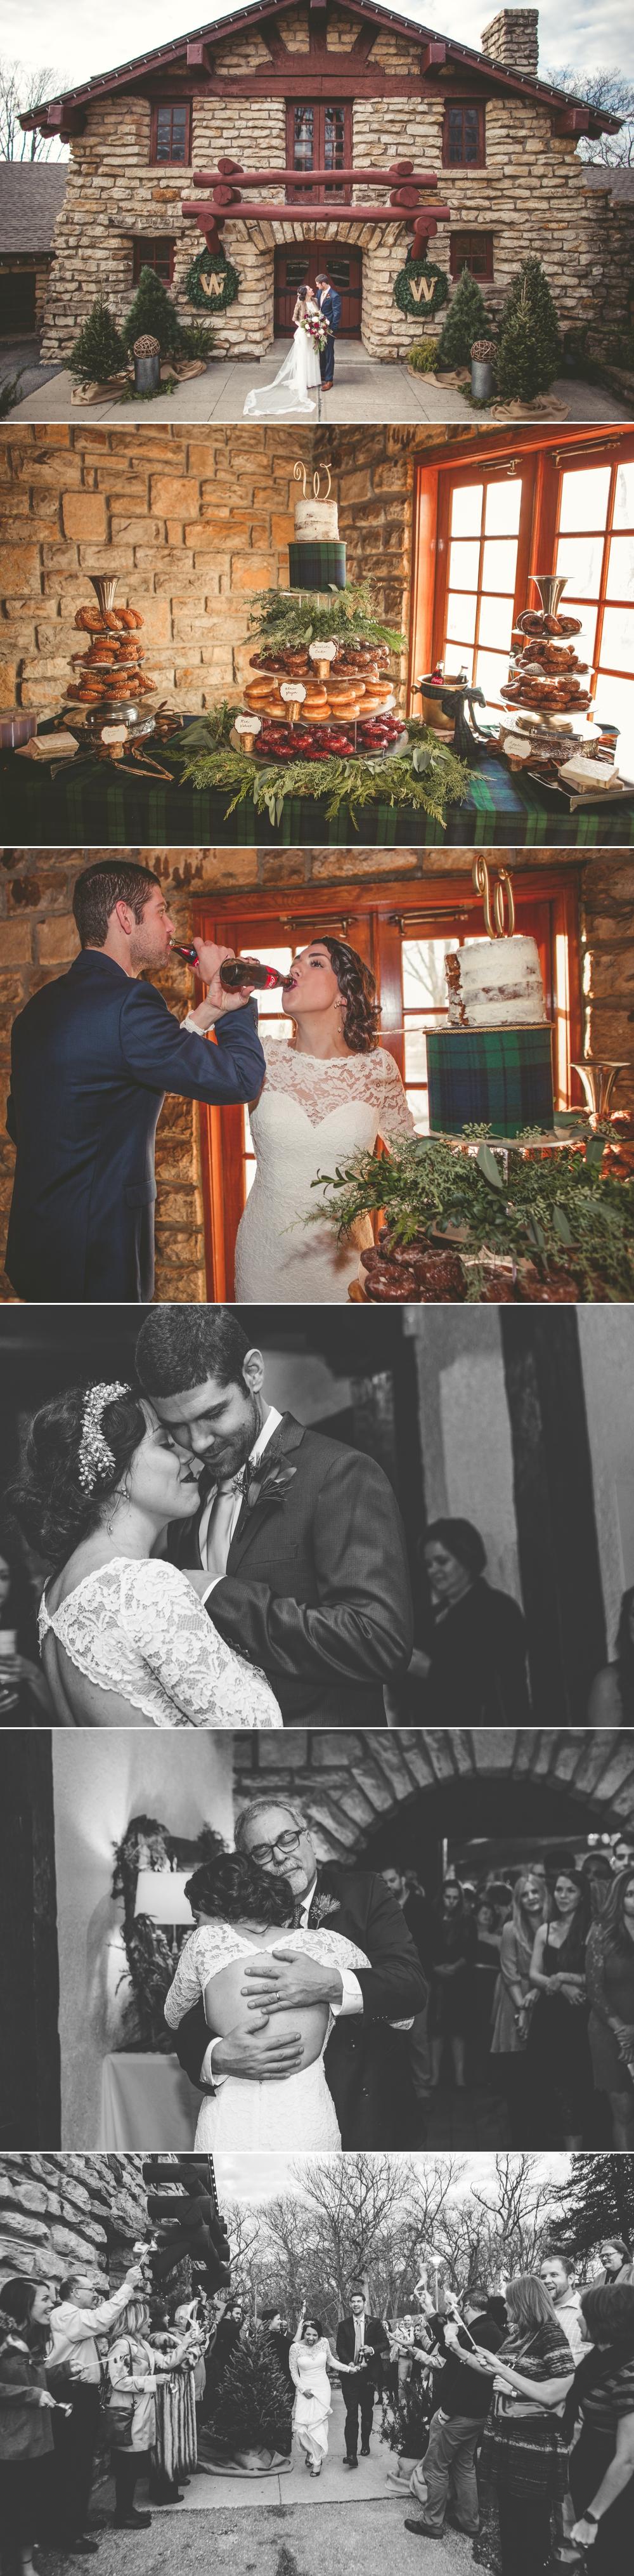 jason_domingues_photography_best_kansas_city_photographer_wedding_kc_weddings_james_p_davis_hall_0005.jpg